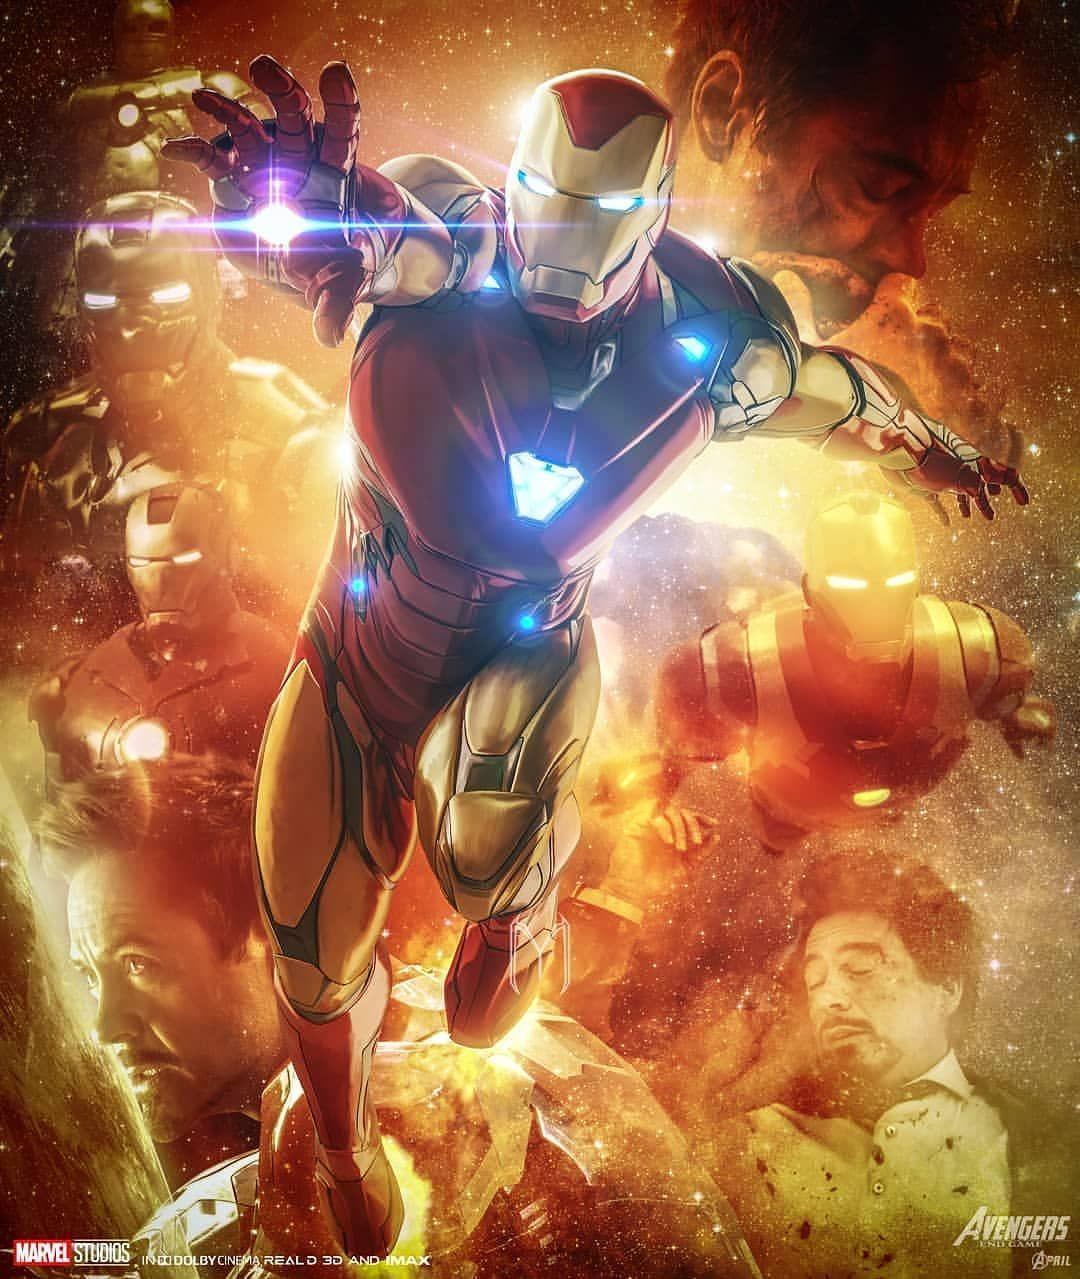 I Am Iron Man Mark 85 Armor Iphone Wallpaper Iron Man Mark 85 Iron Man Iron Man Art